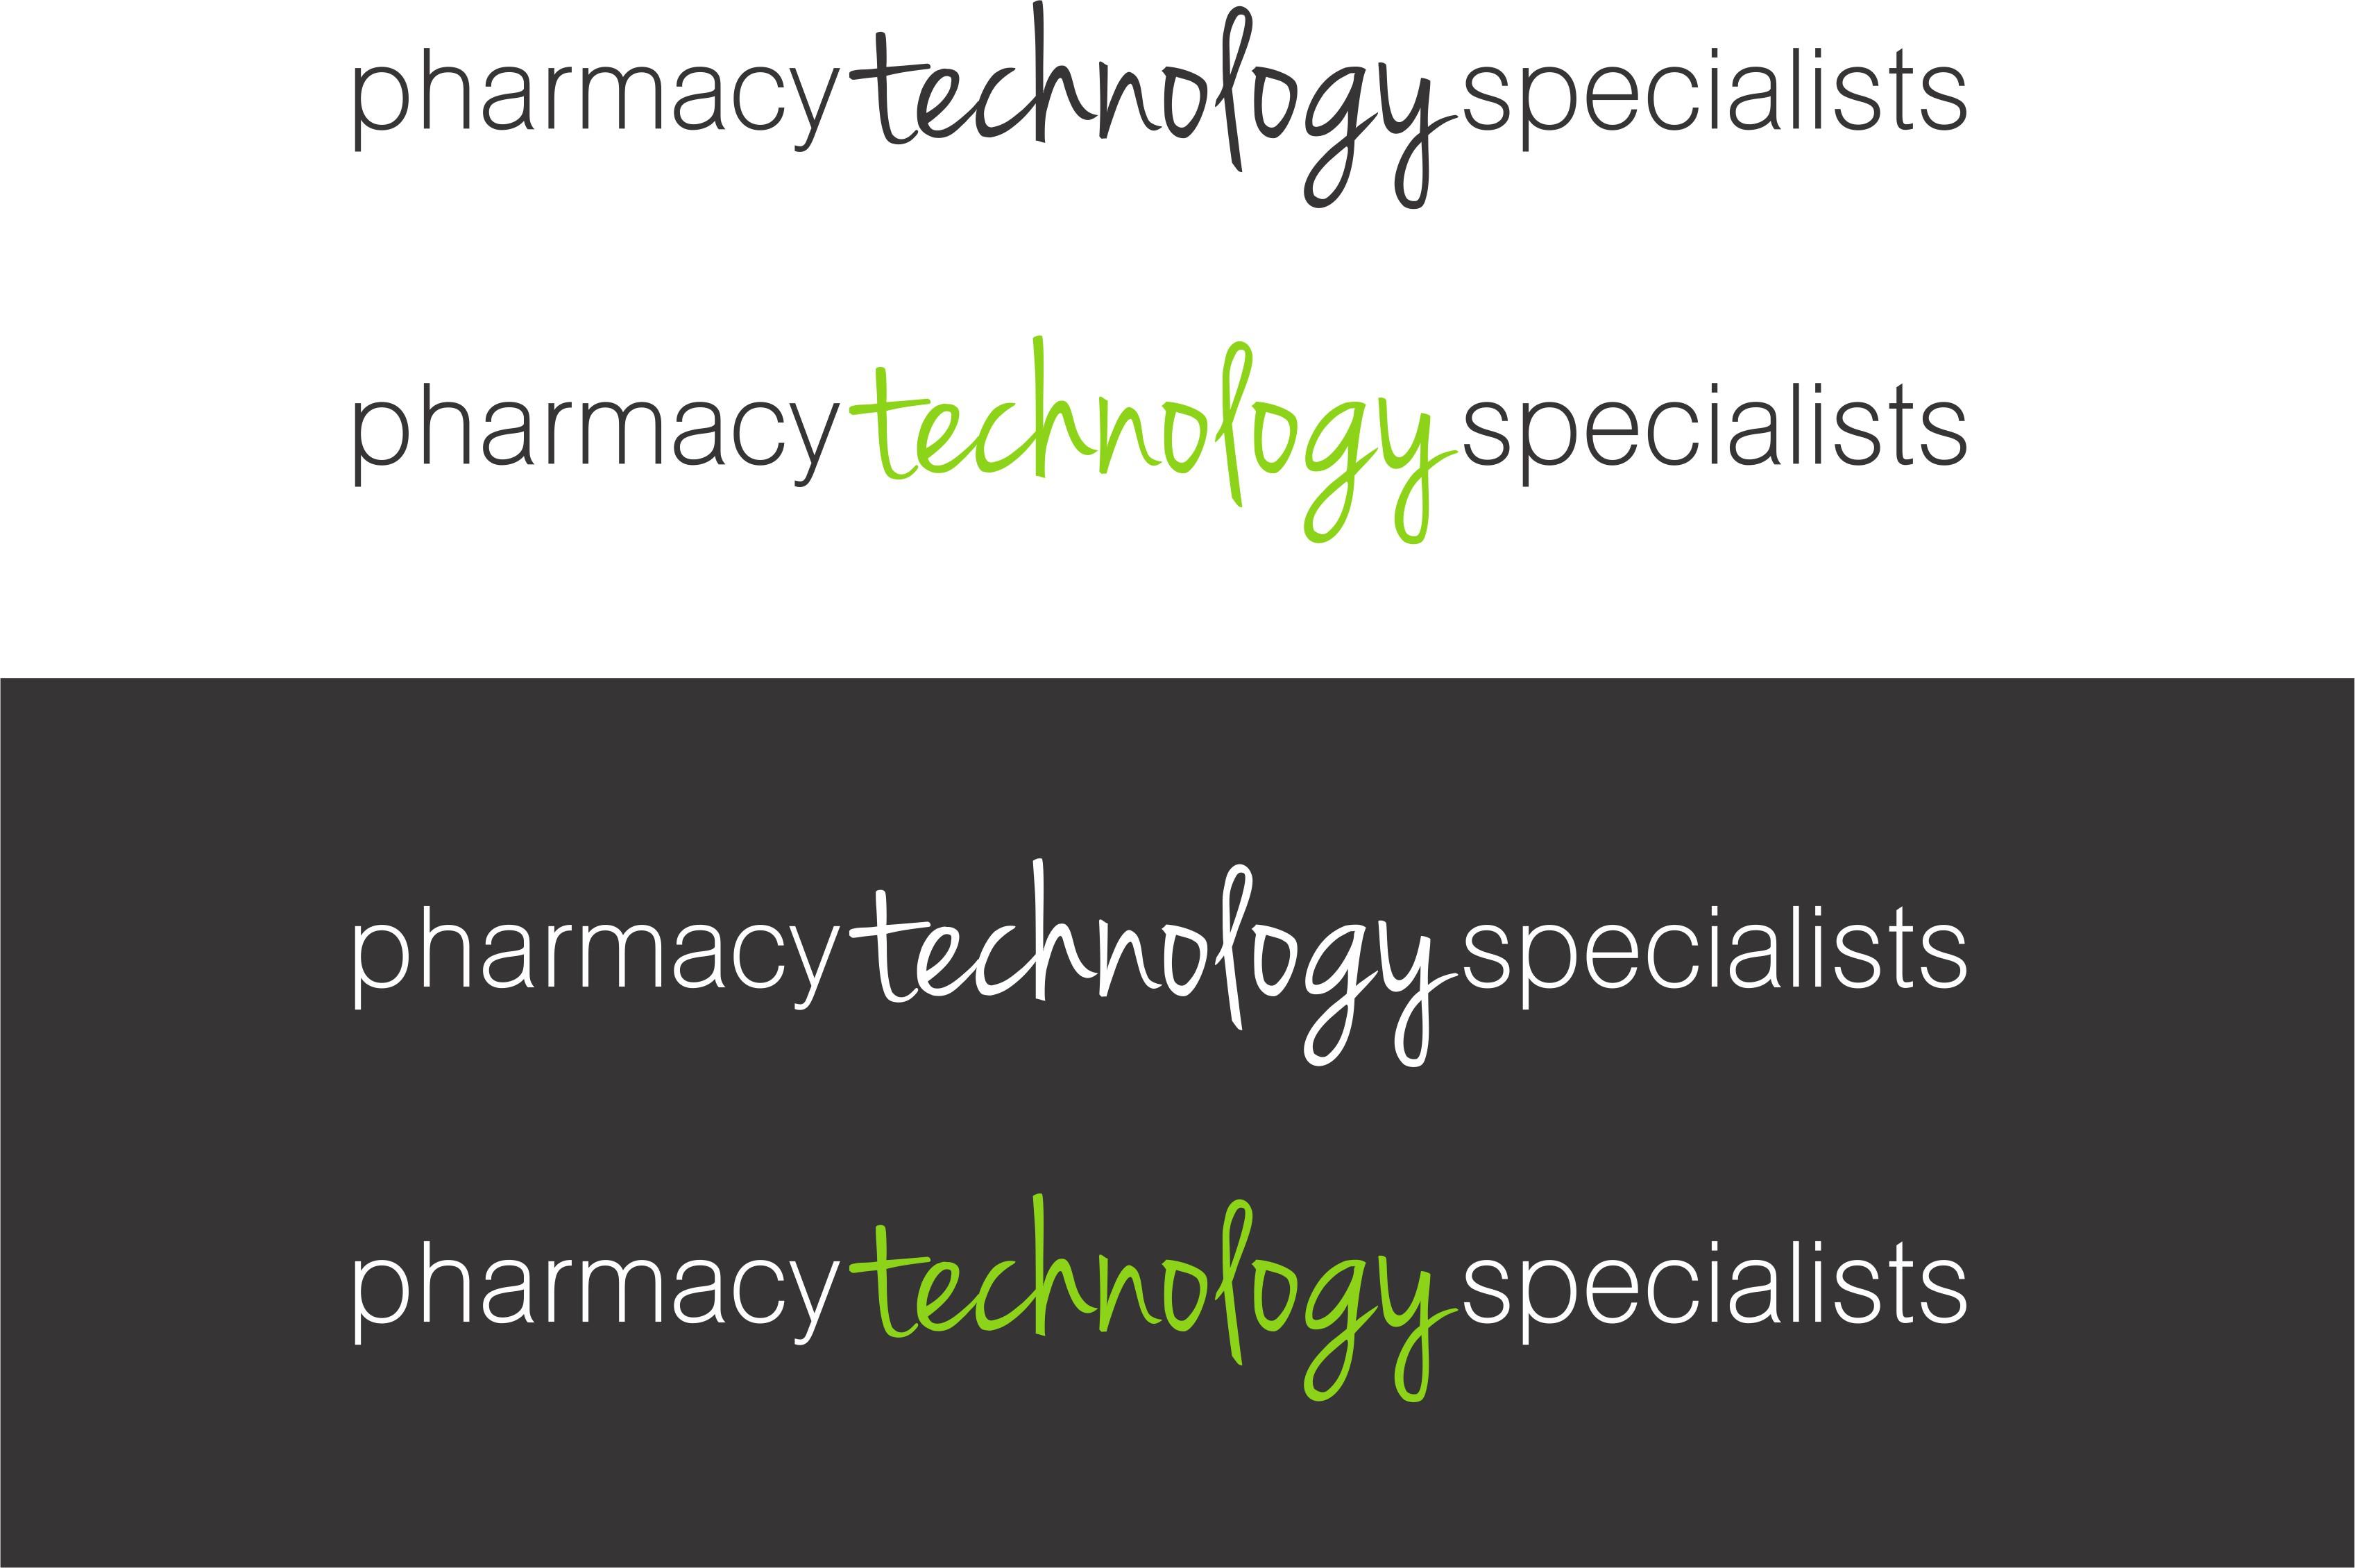 Slight Modifications to branding